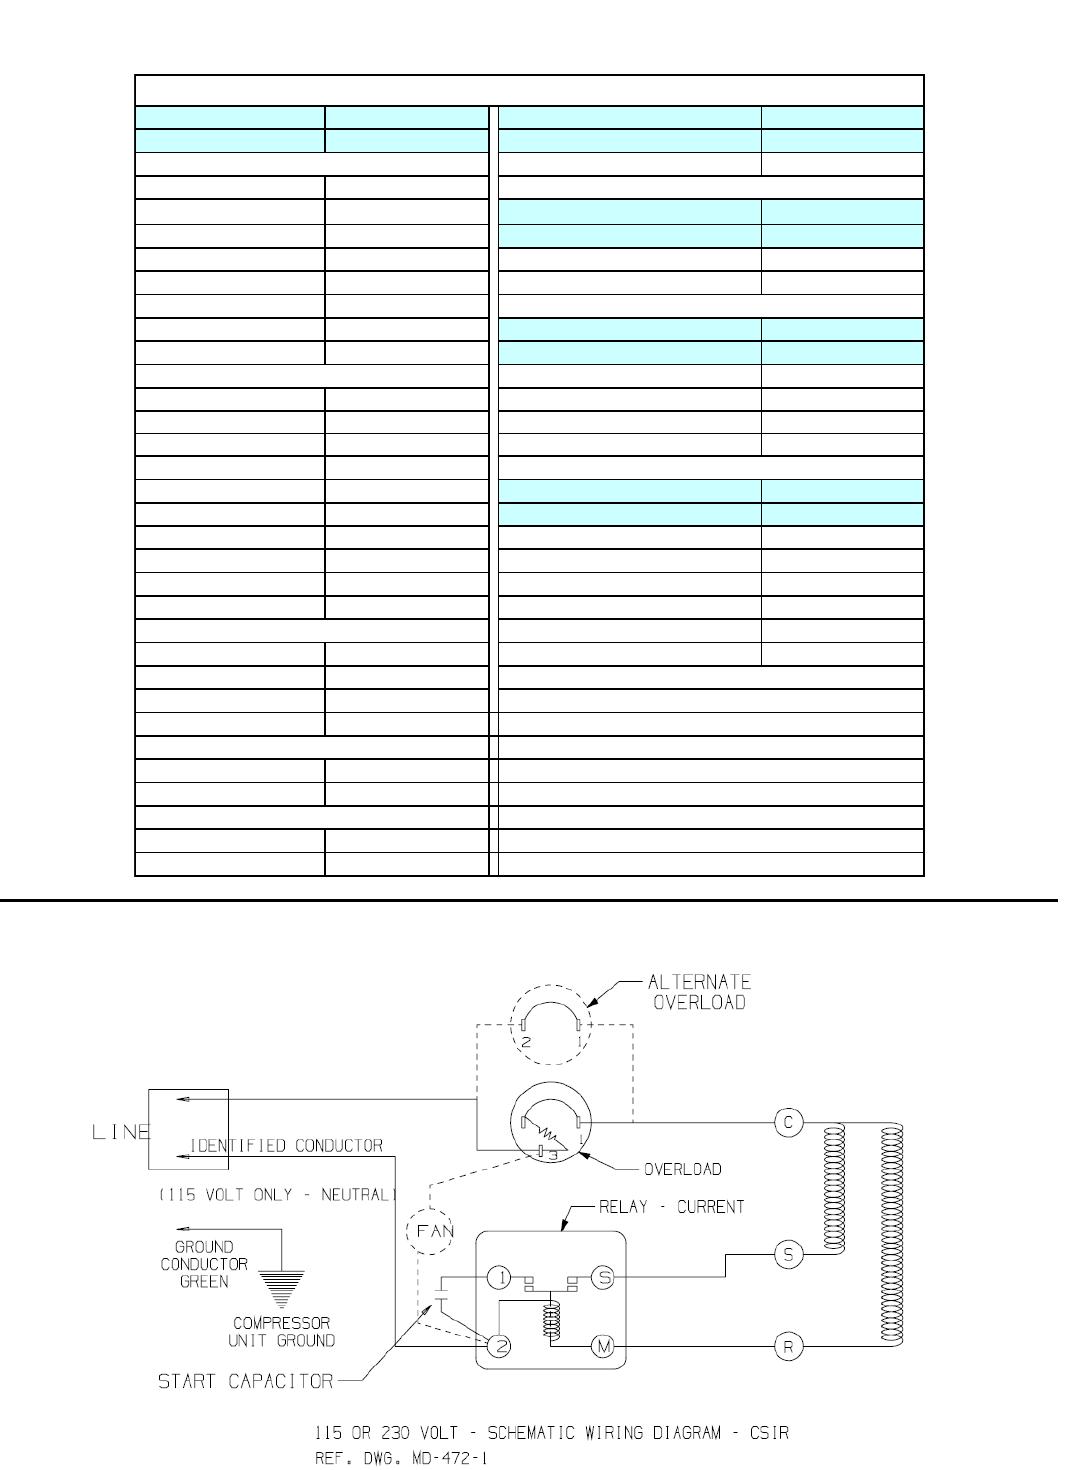 Tecumseh Ae2415z Aa1aeb Performance Data Sheet Condenser Wiring Diagram Unit Bom 32v328 19 29